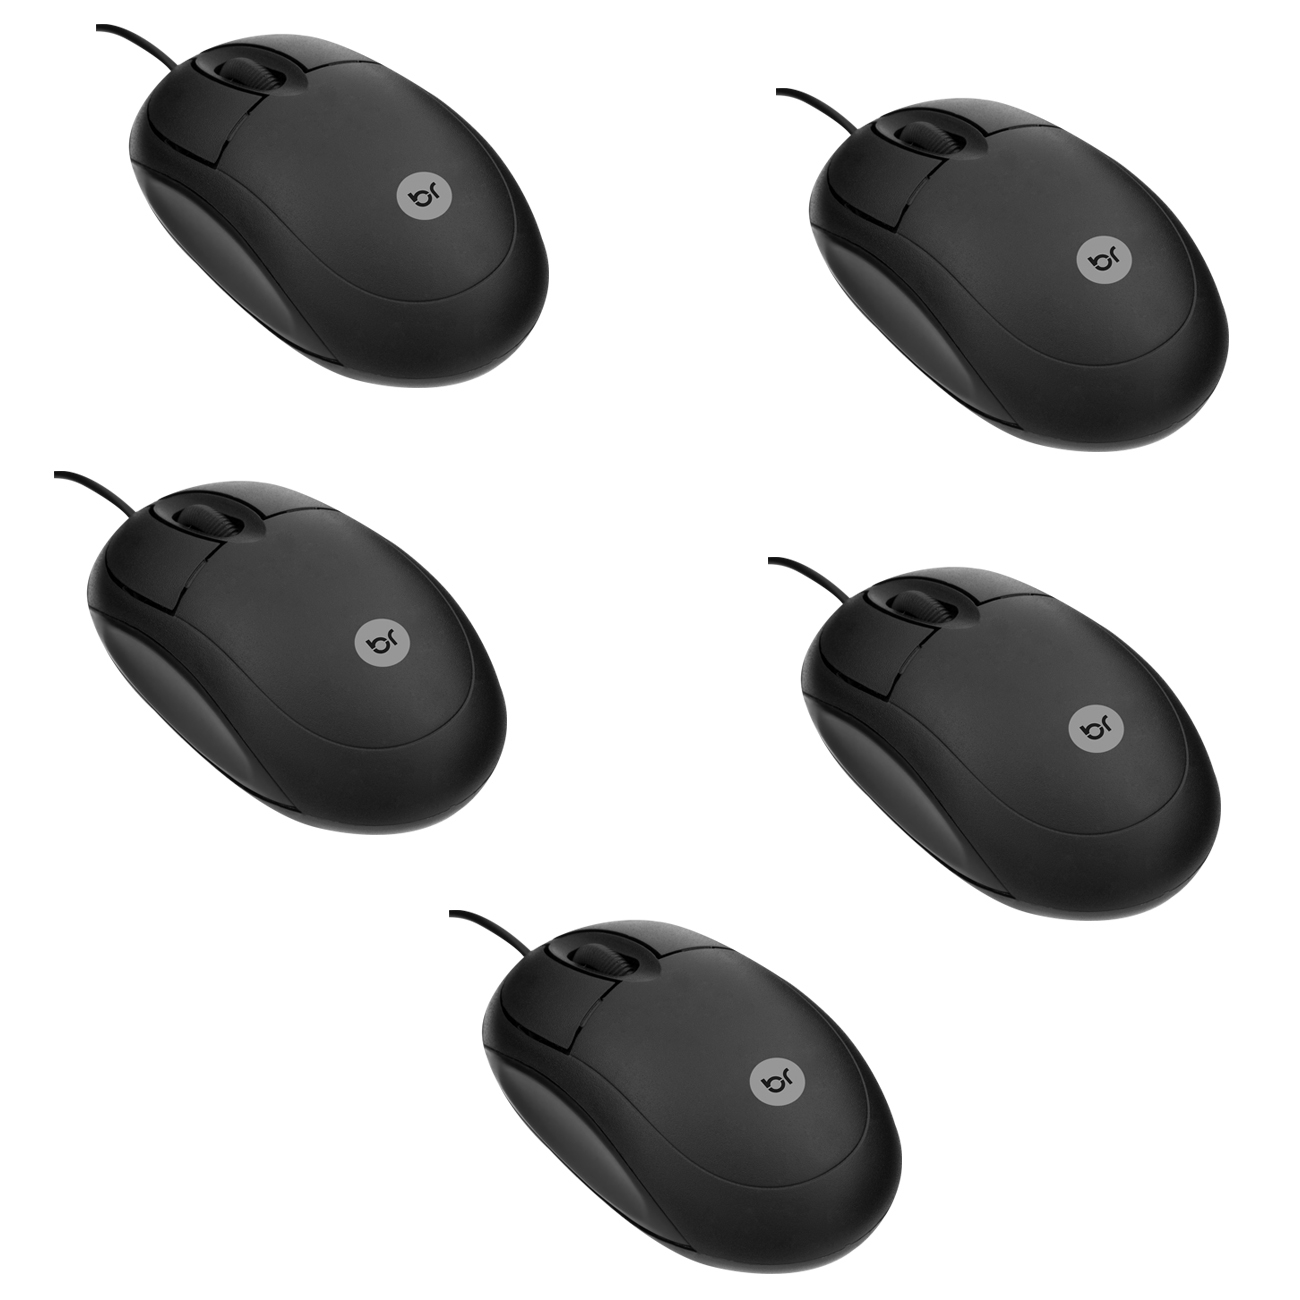 Kit 5 Mouse Óptico Usb Basic Preto 800 Dpi 106 Bright  - BRIGHT